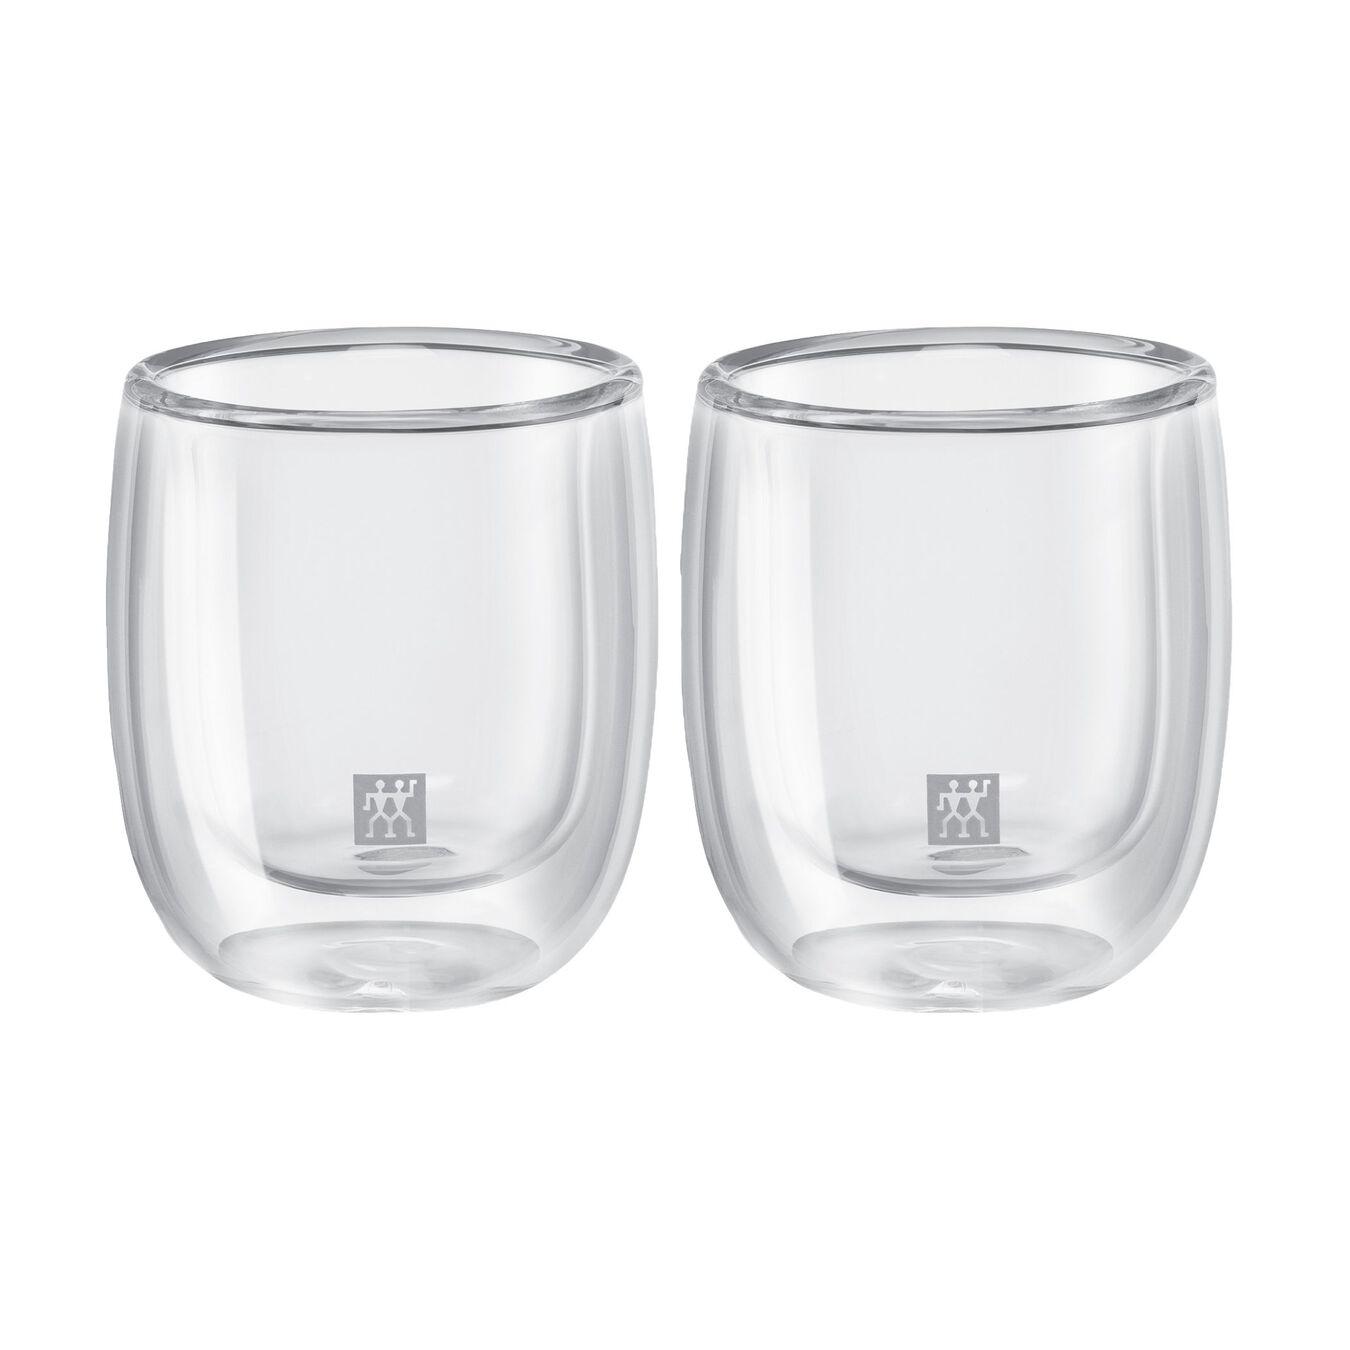 Espresso Bardağı Seti | Cam | 2-adet,,large 5